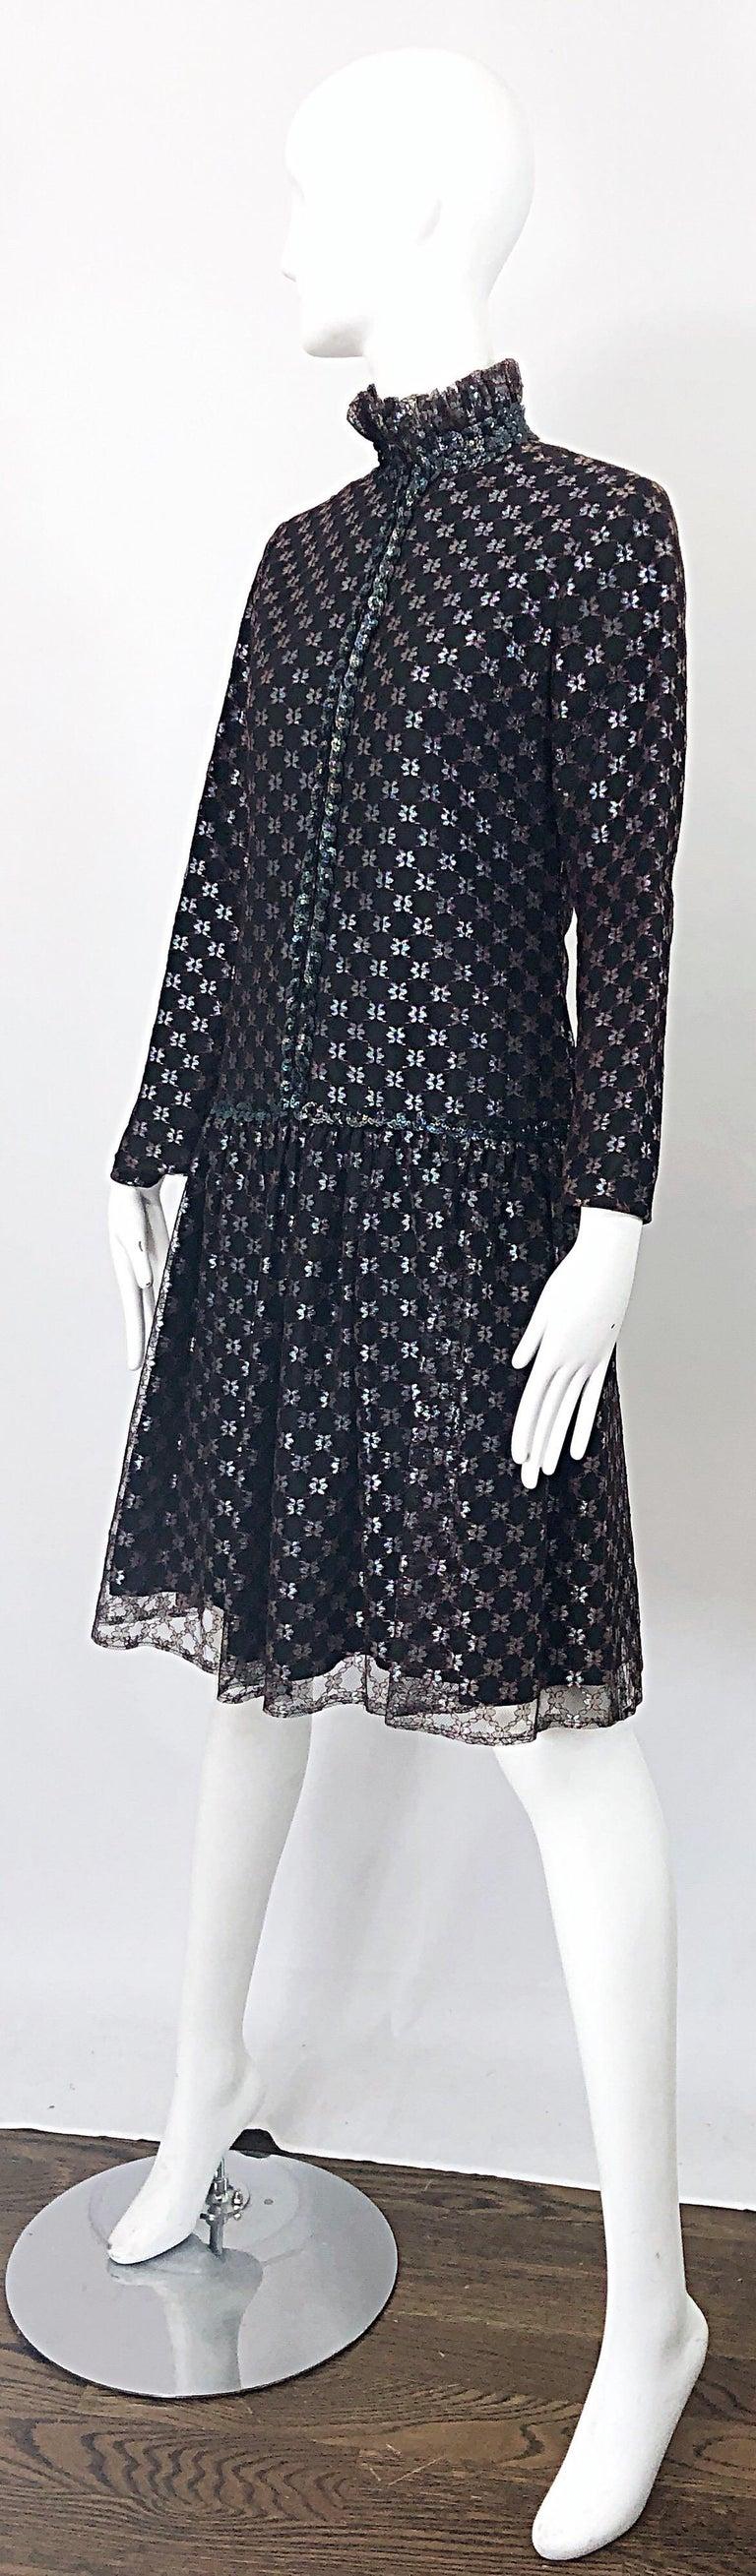 Oscar de la Renta 1970s Black + Burgundy Red Iridescent Sequin Drop Waist Dress For Sale 1